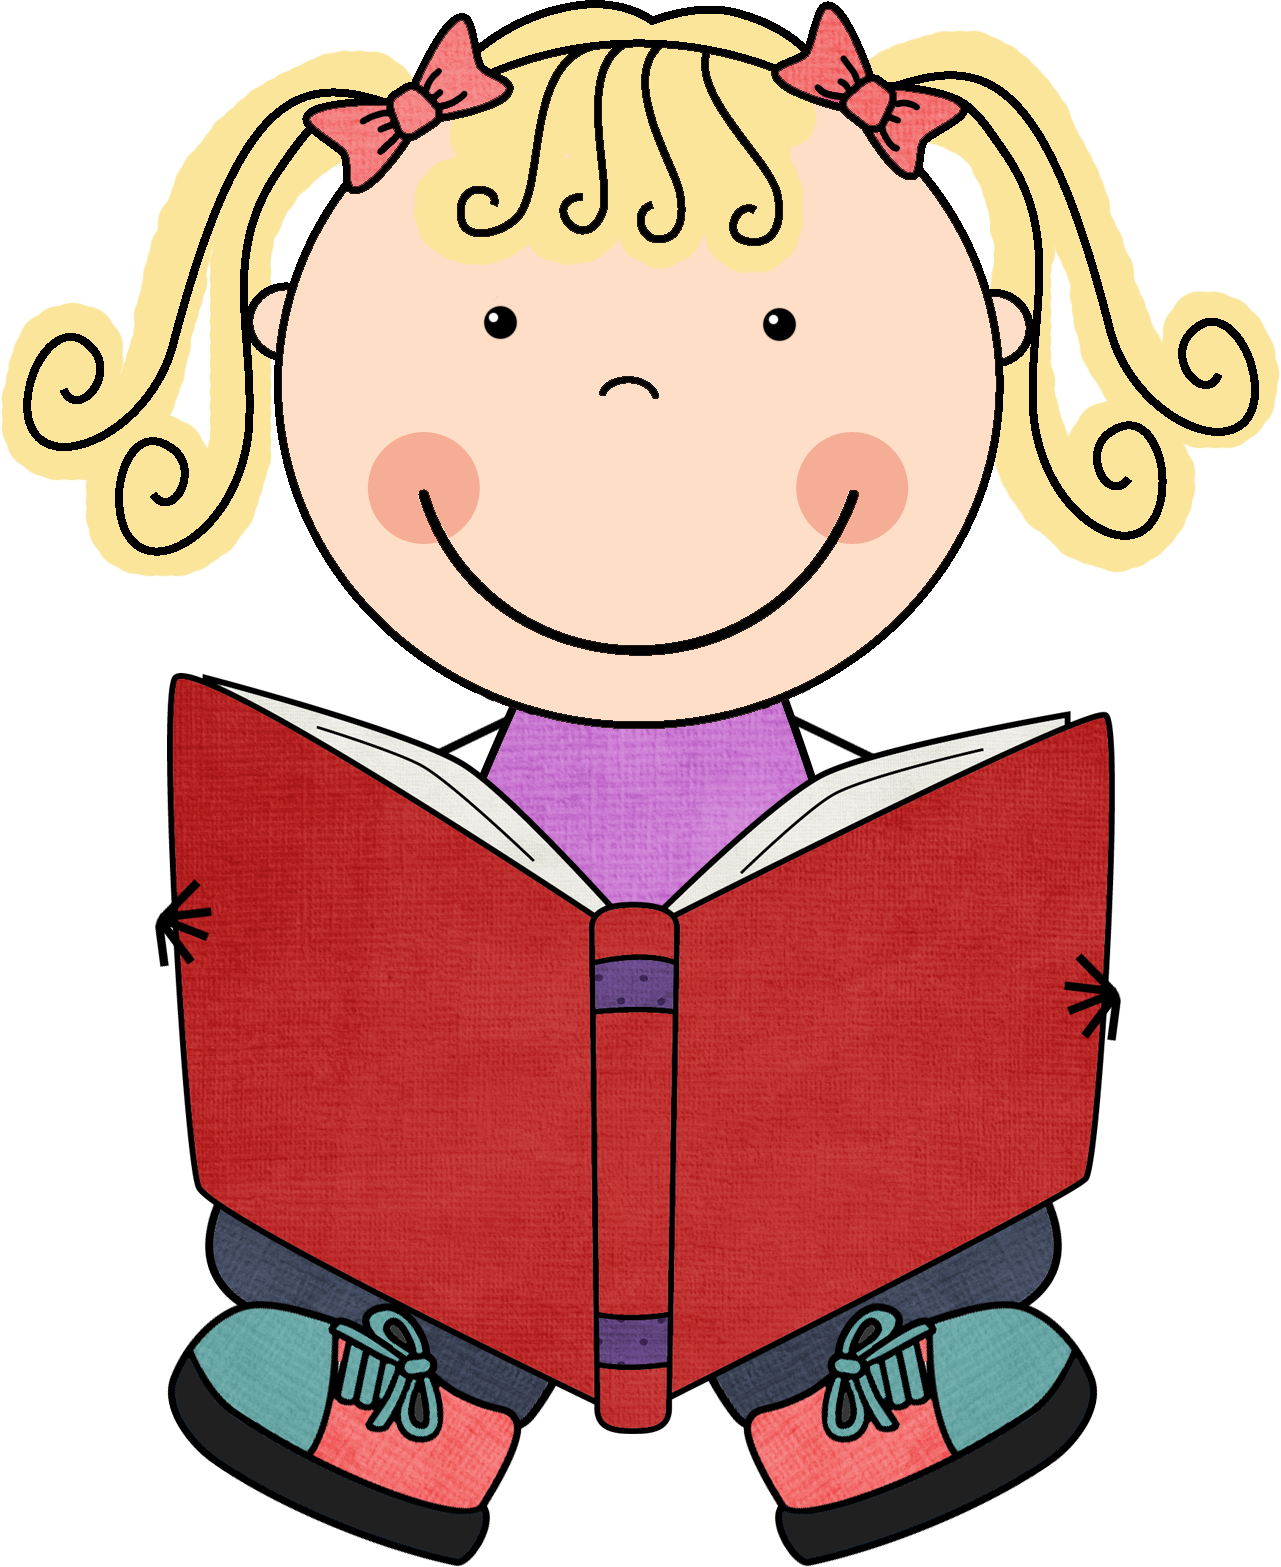 Stick kids reading clipart - ClipartFest